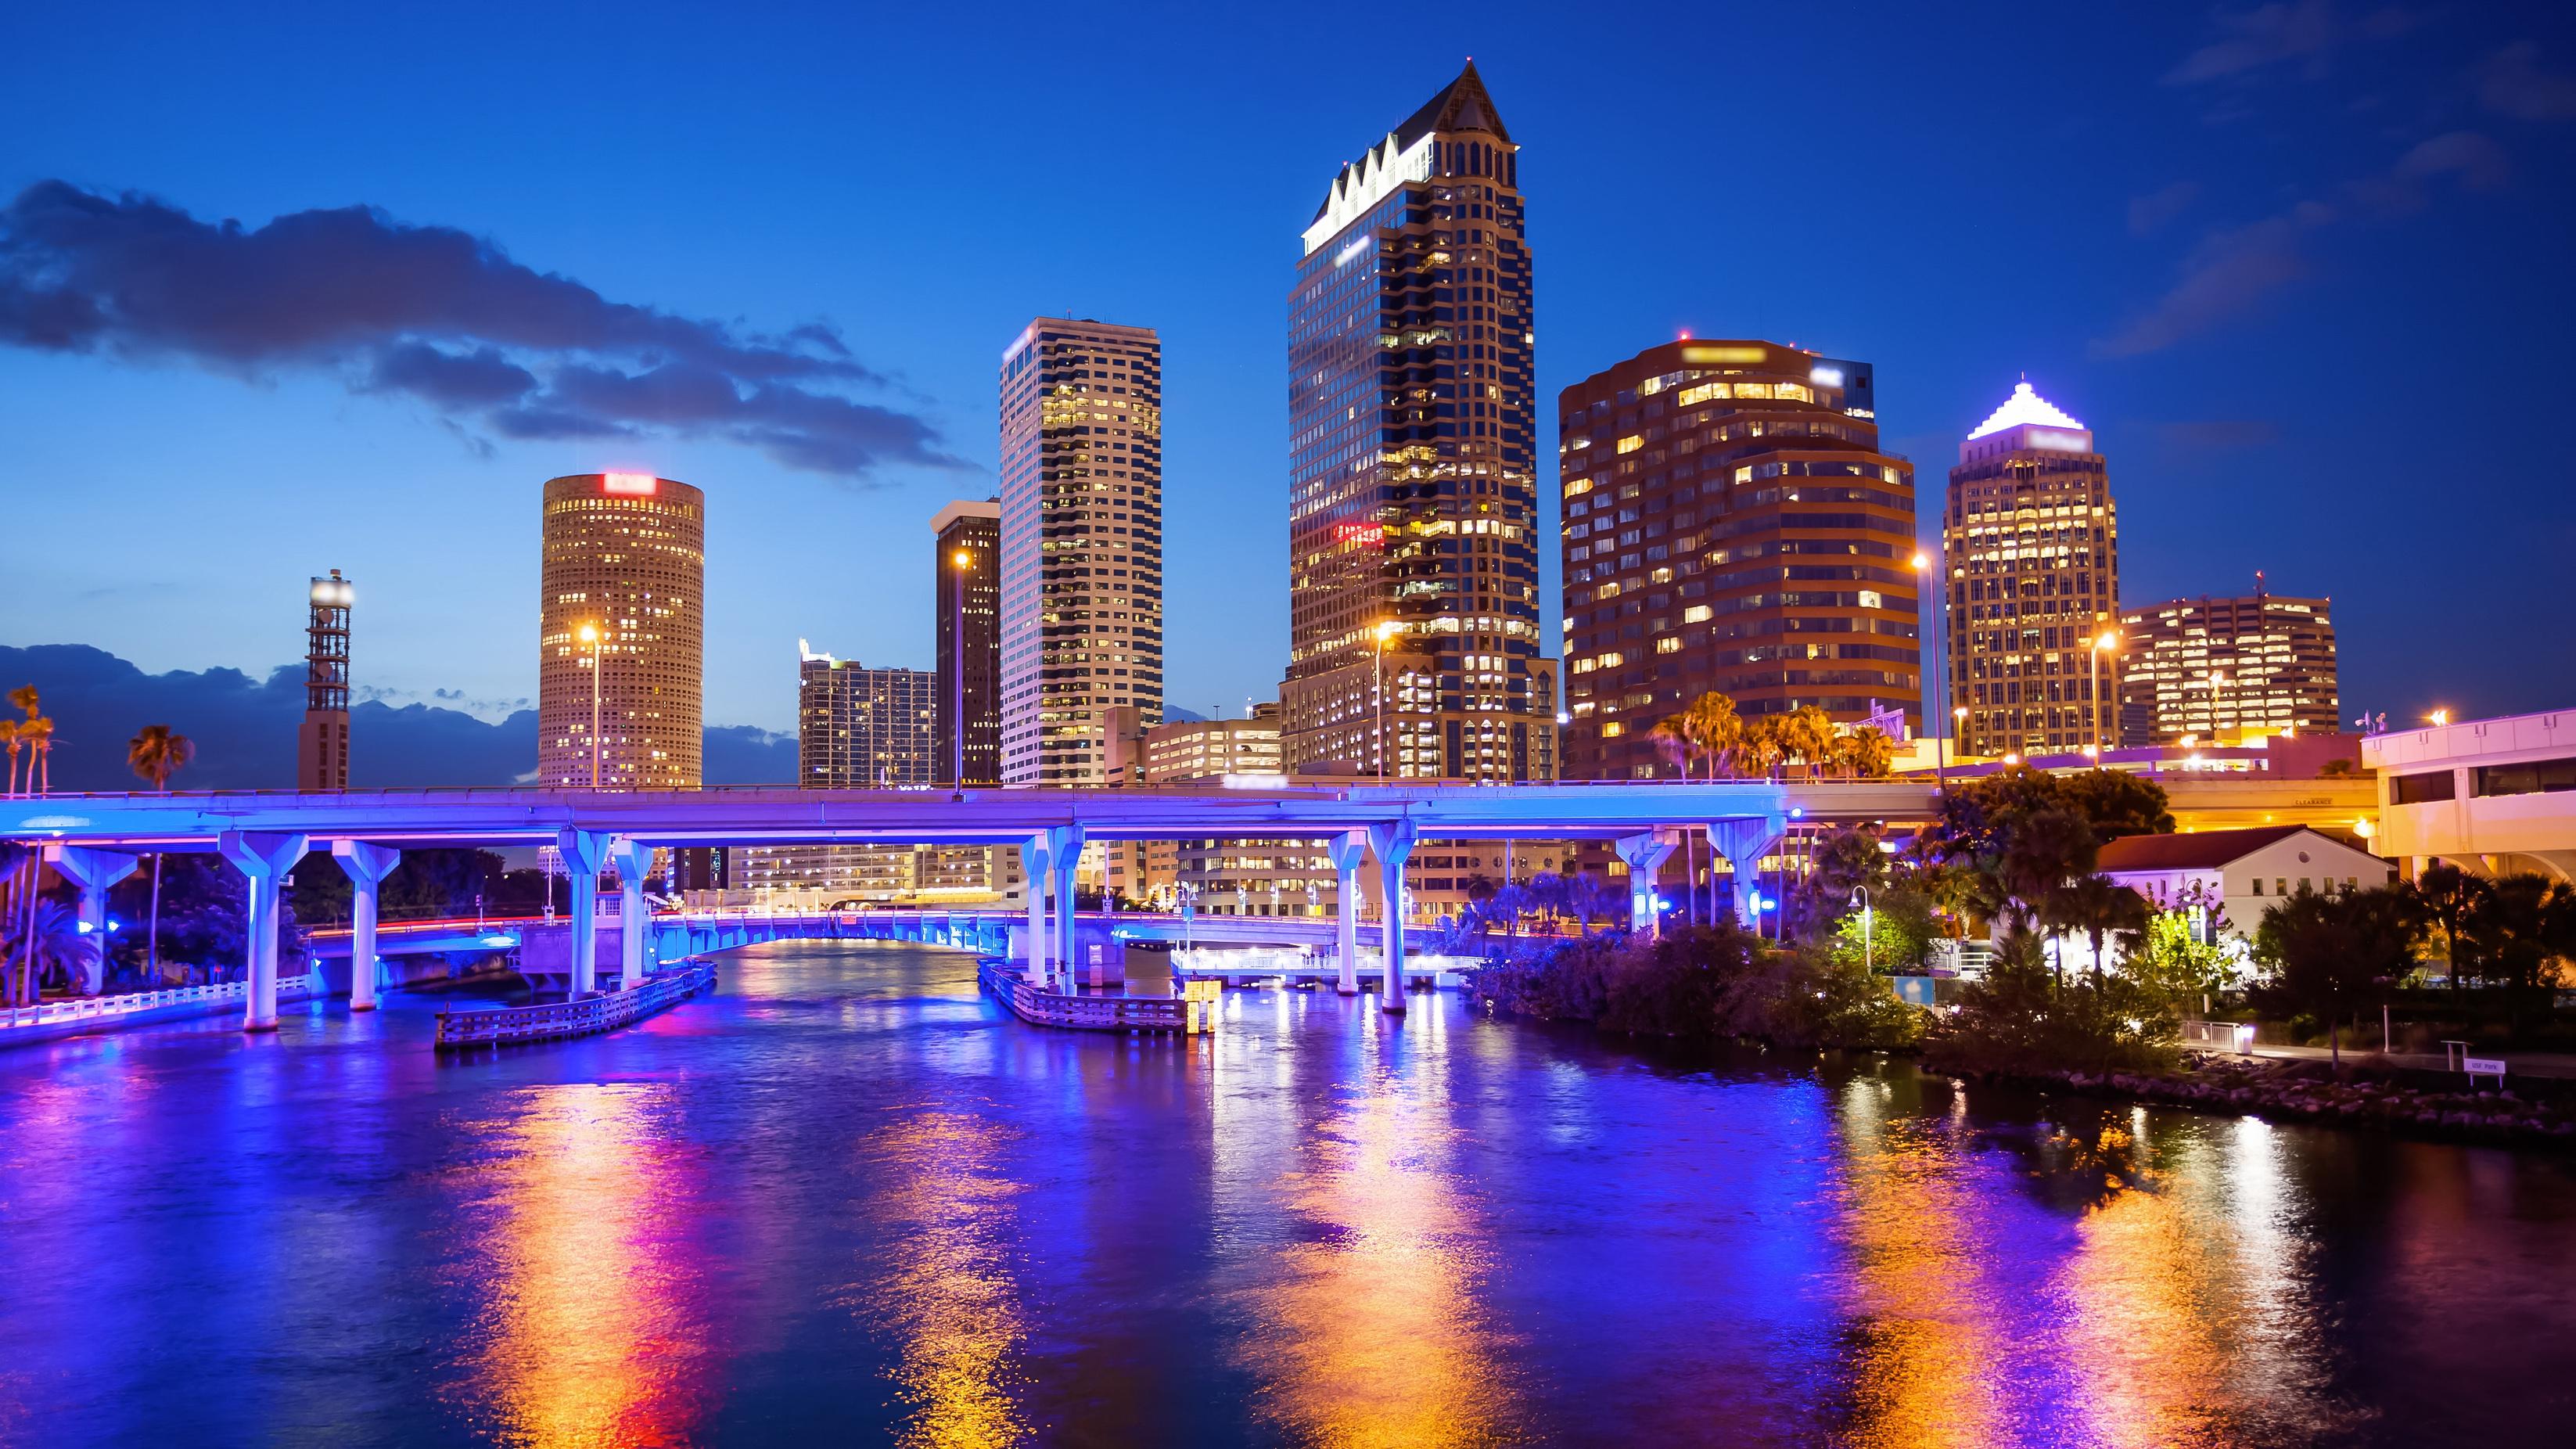 House Passes Water Street Tampa Development Measure